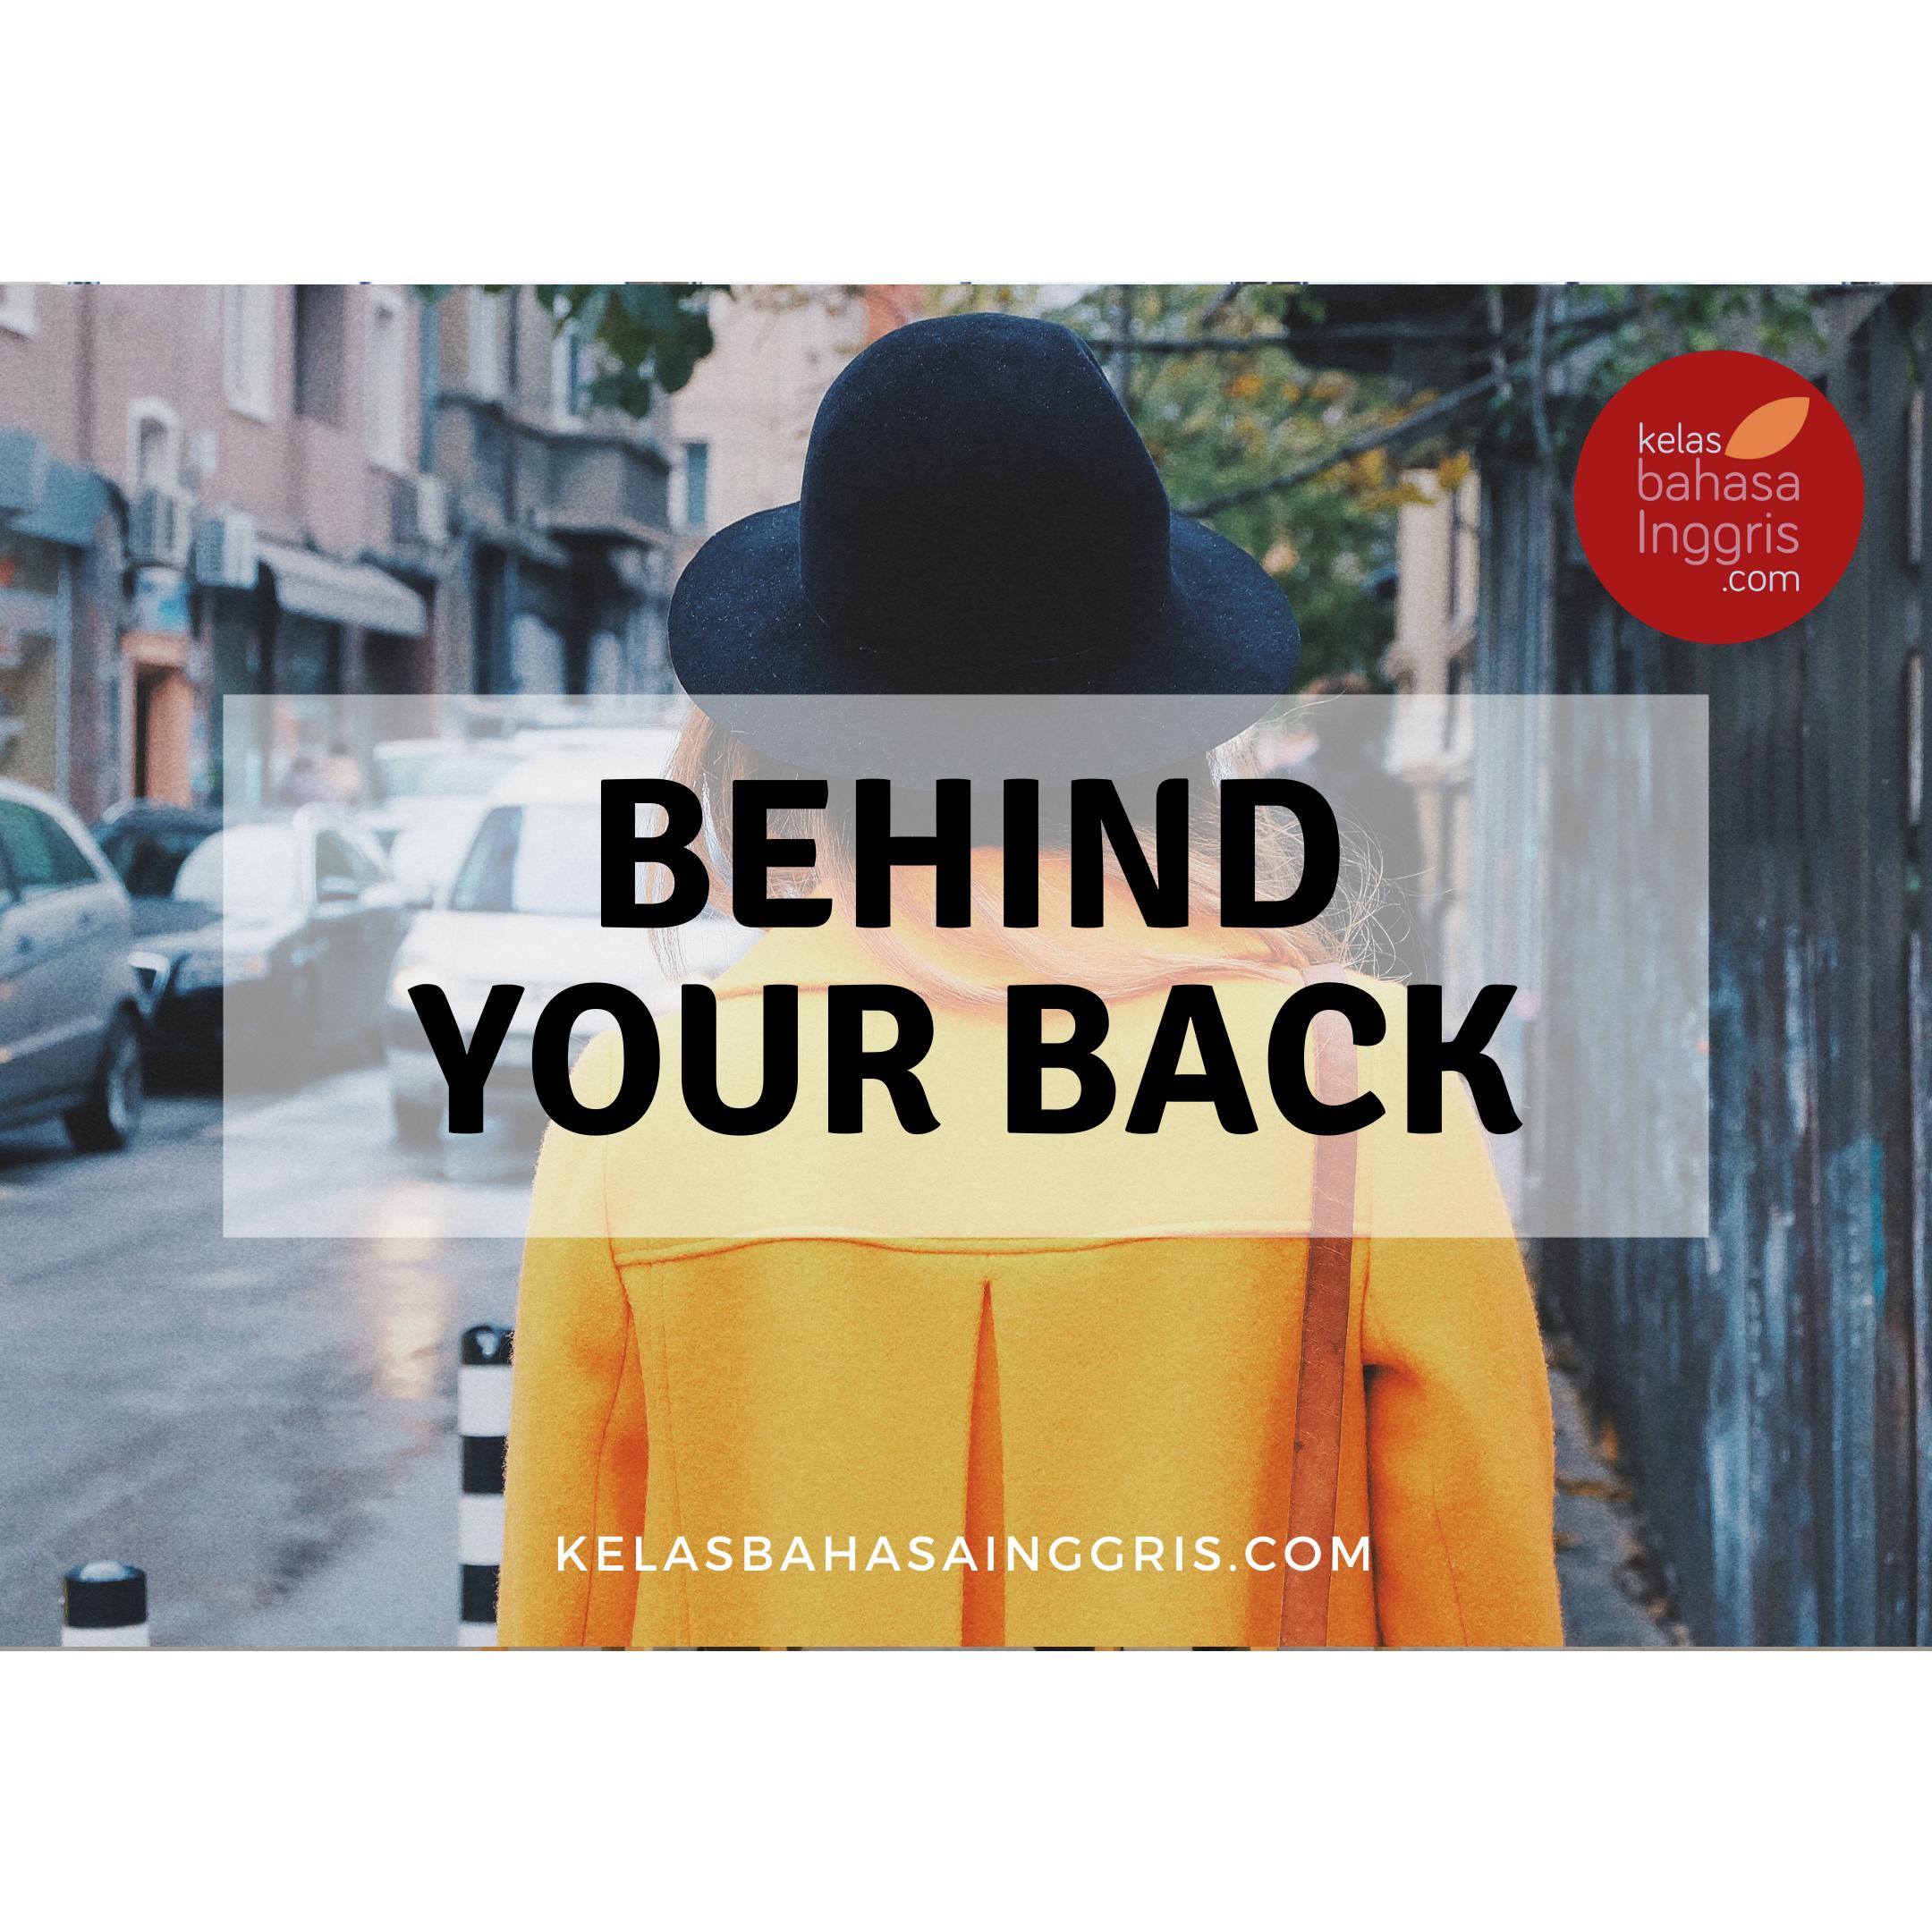 Idiom Bahasa Inggris behind your back